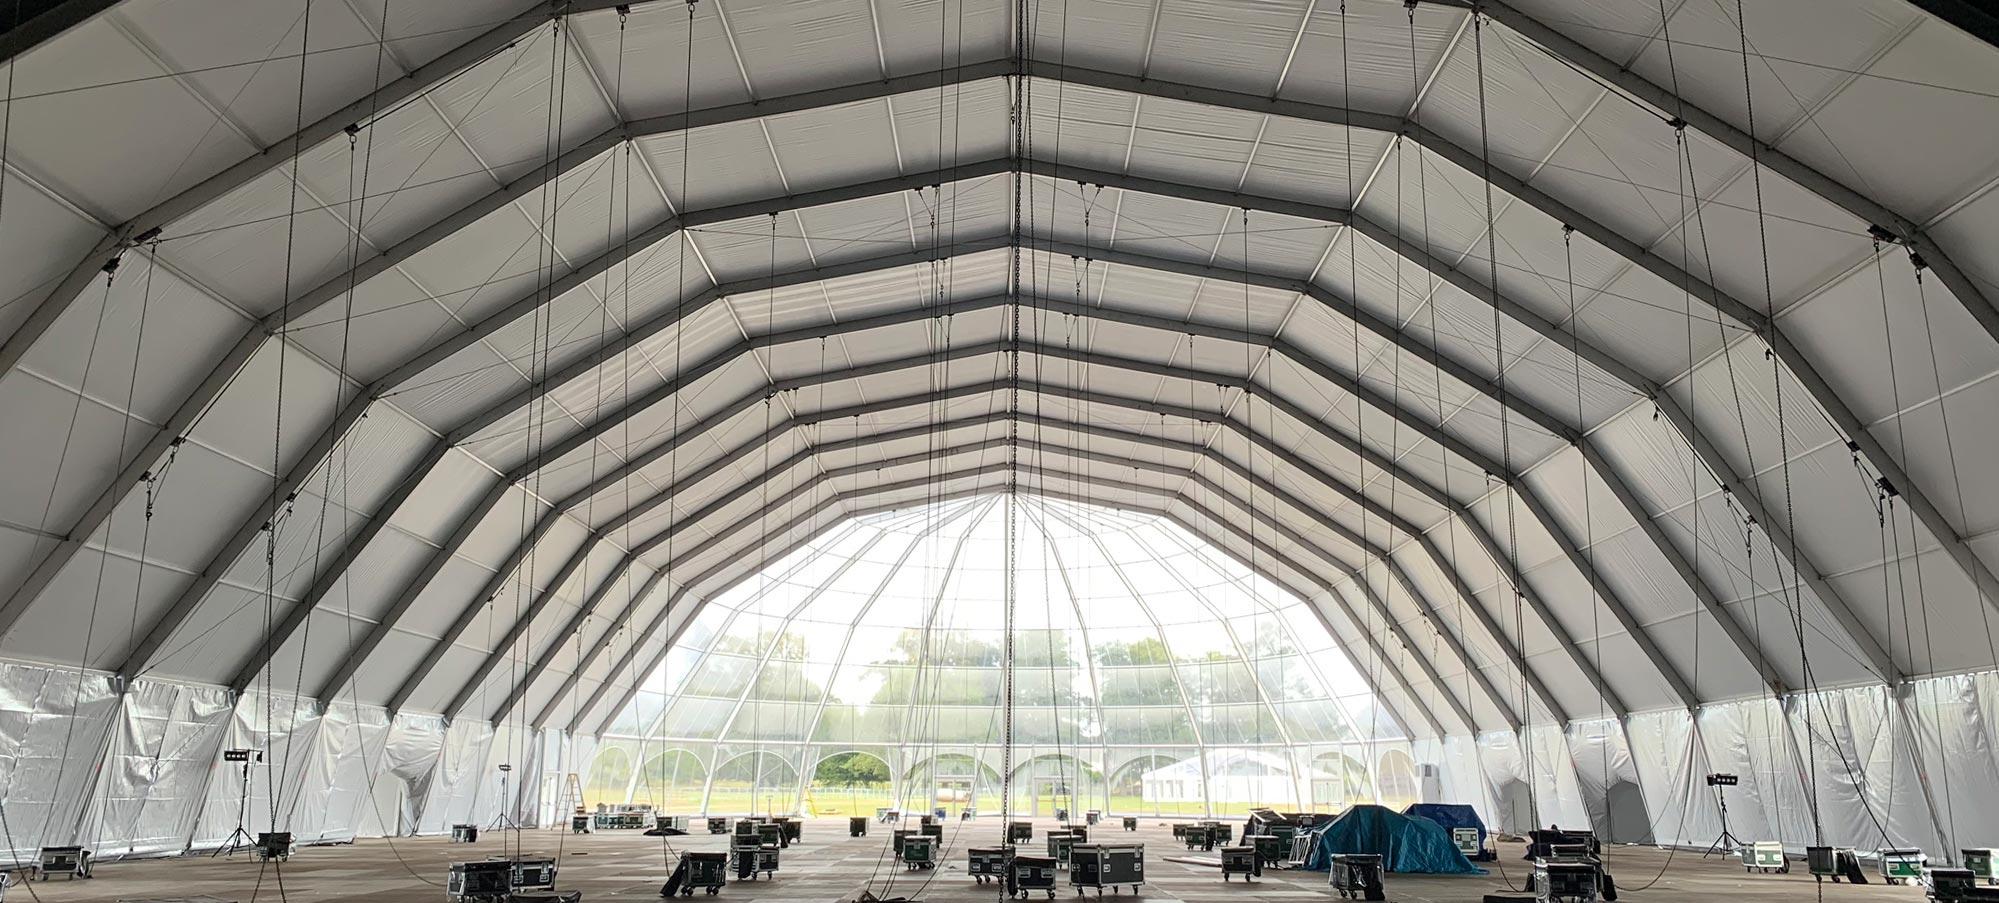 Igloo Structure Interior